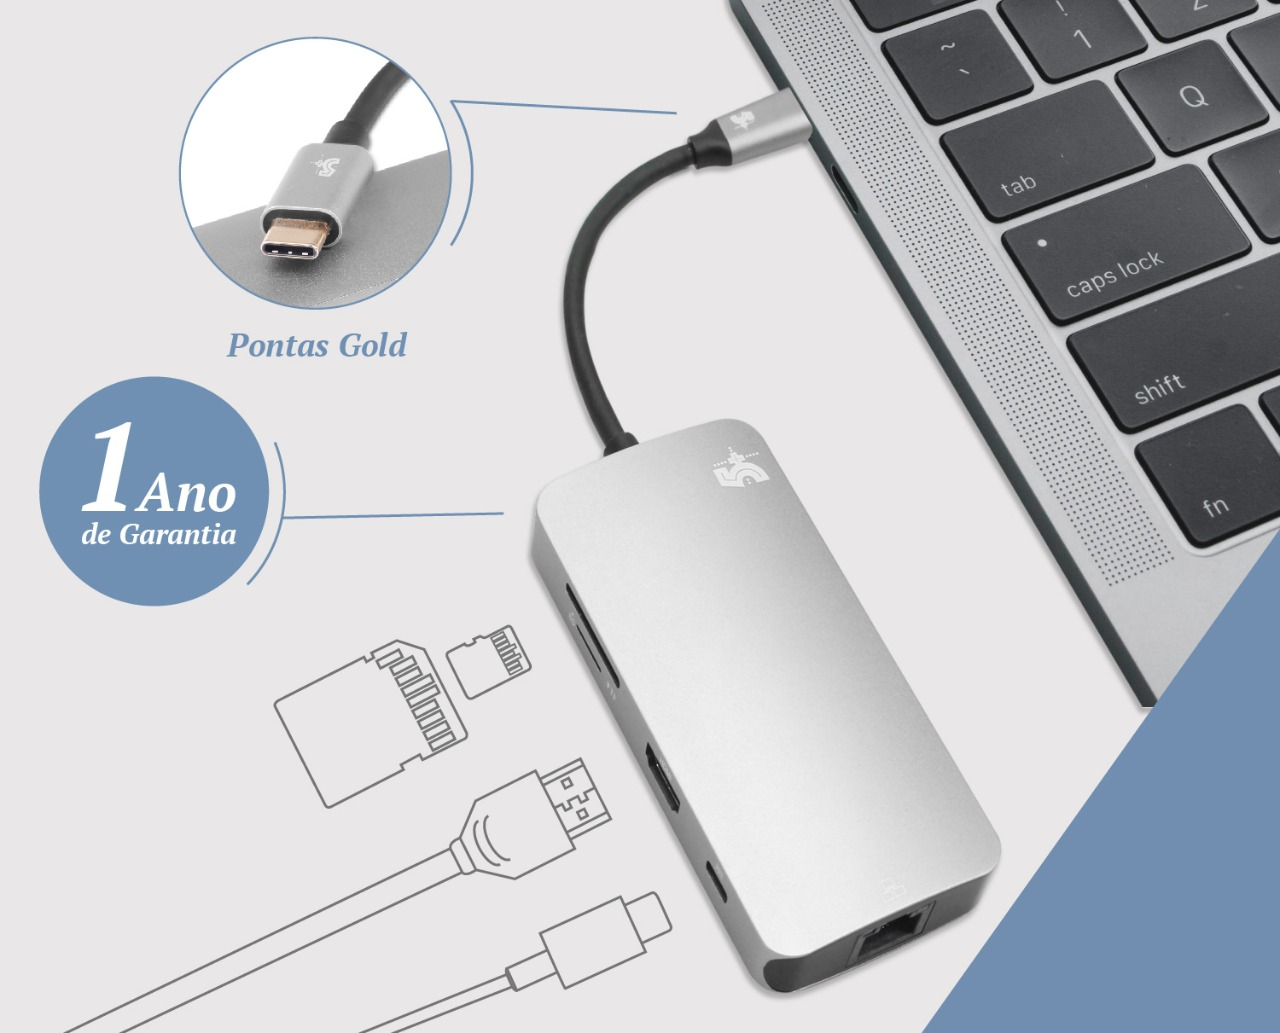 HUB USB C - 7X1 P/ HDMI, RJ45, USB 3, SD, TF, USB C/F PD